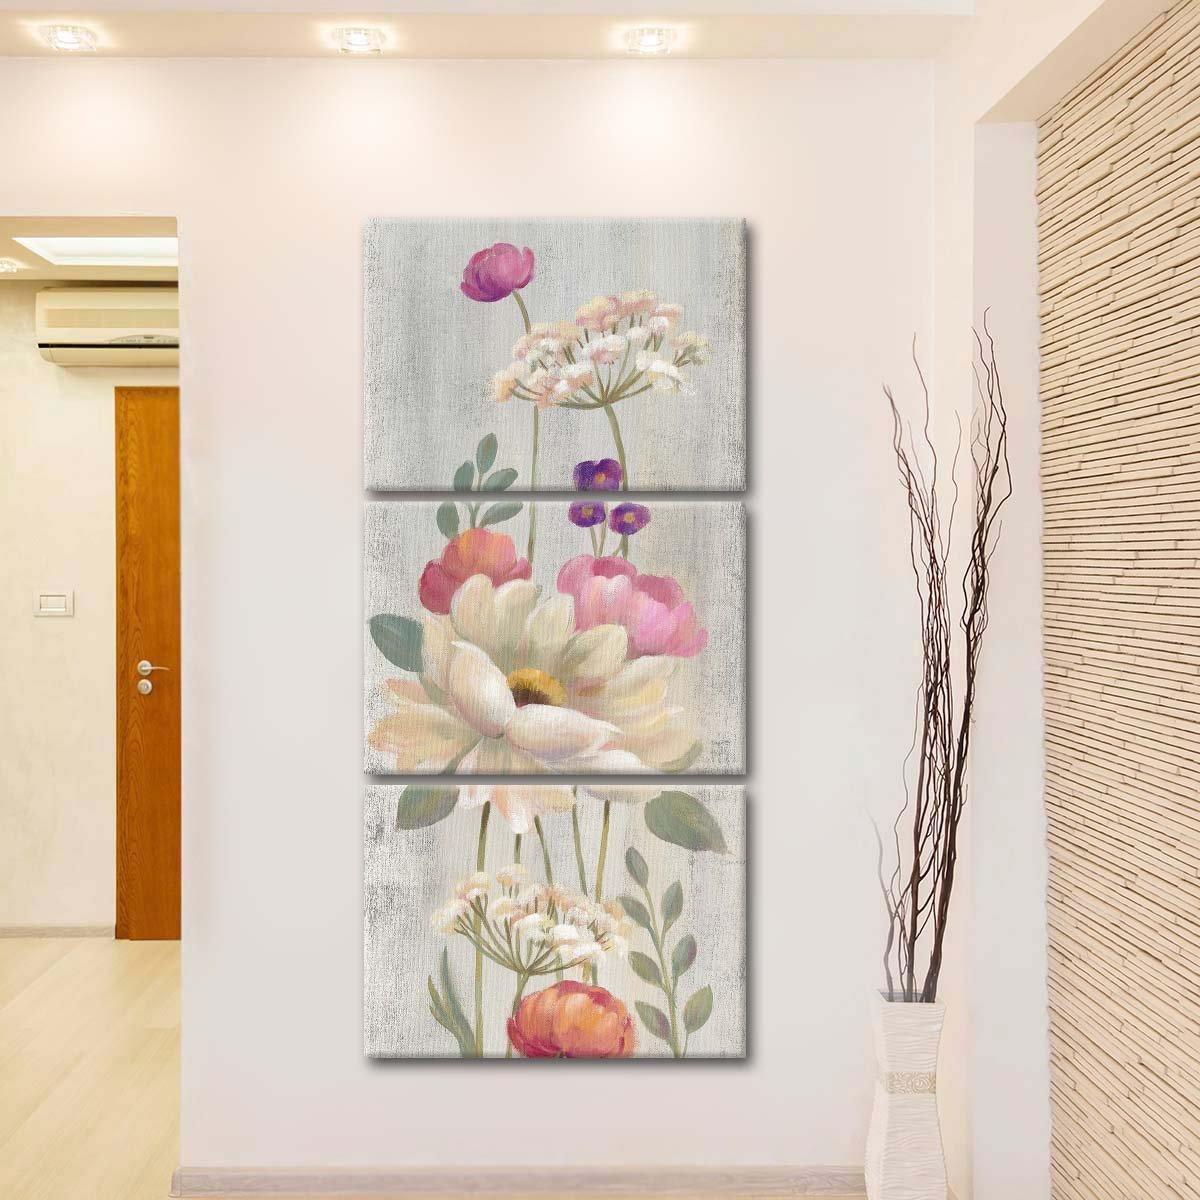 Retro Floral I Multi Panel Canvas Wall Art